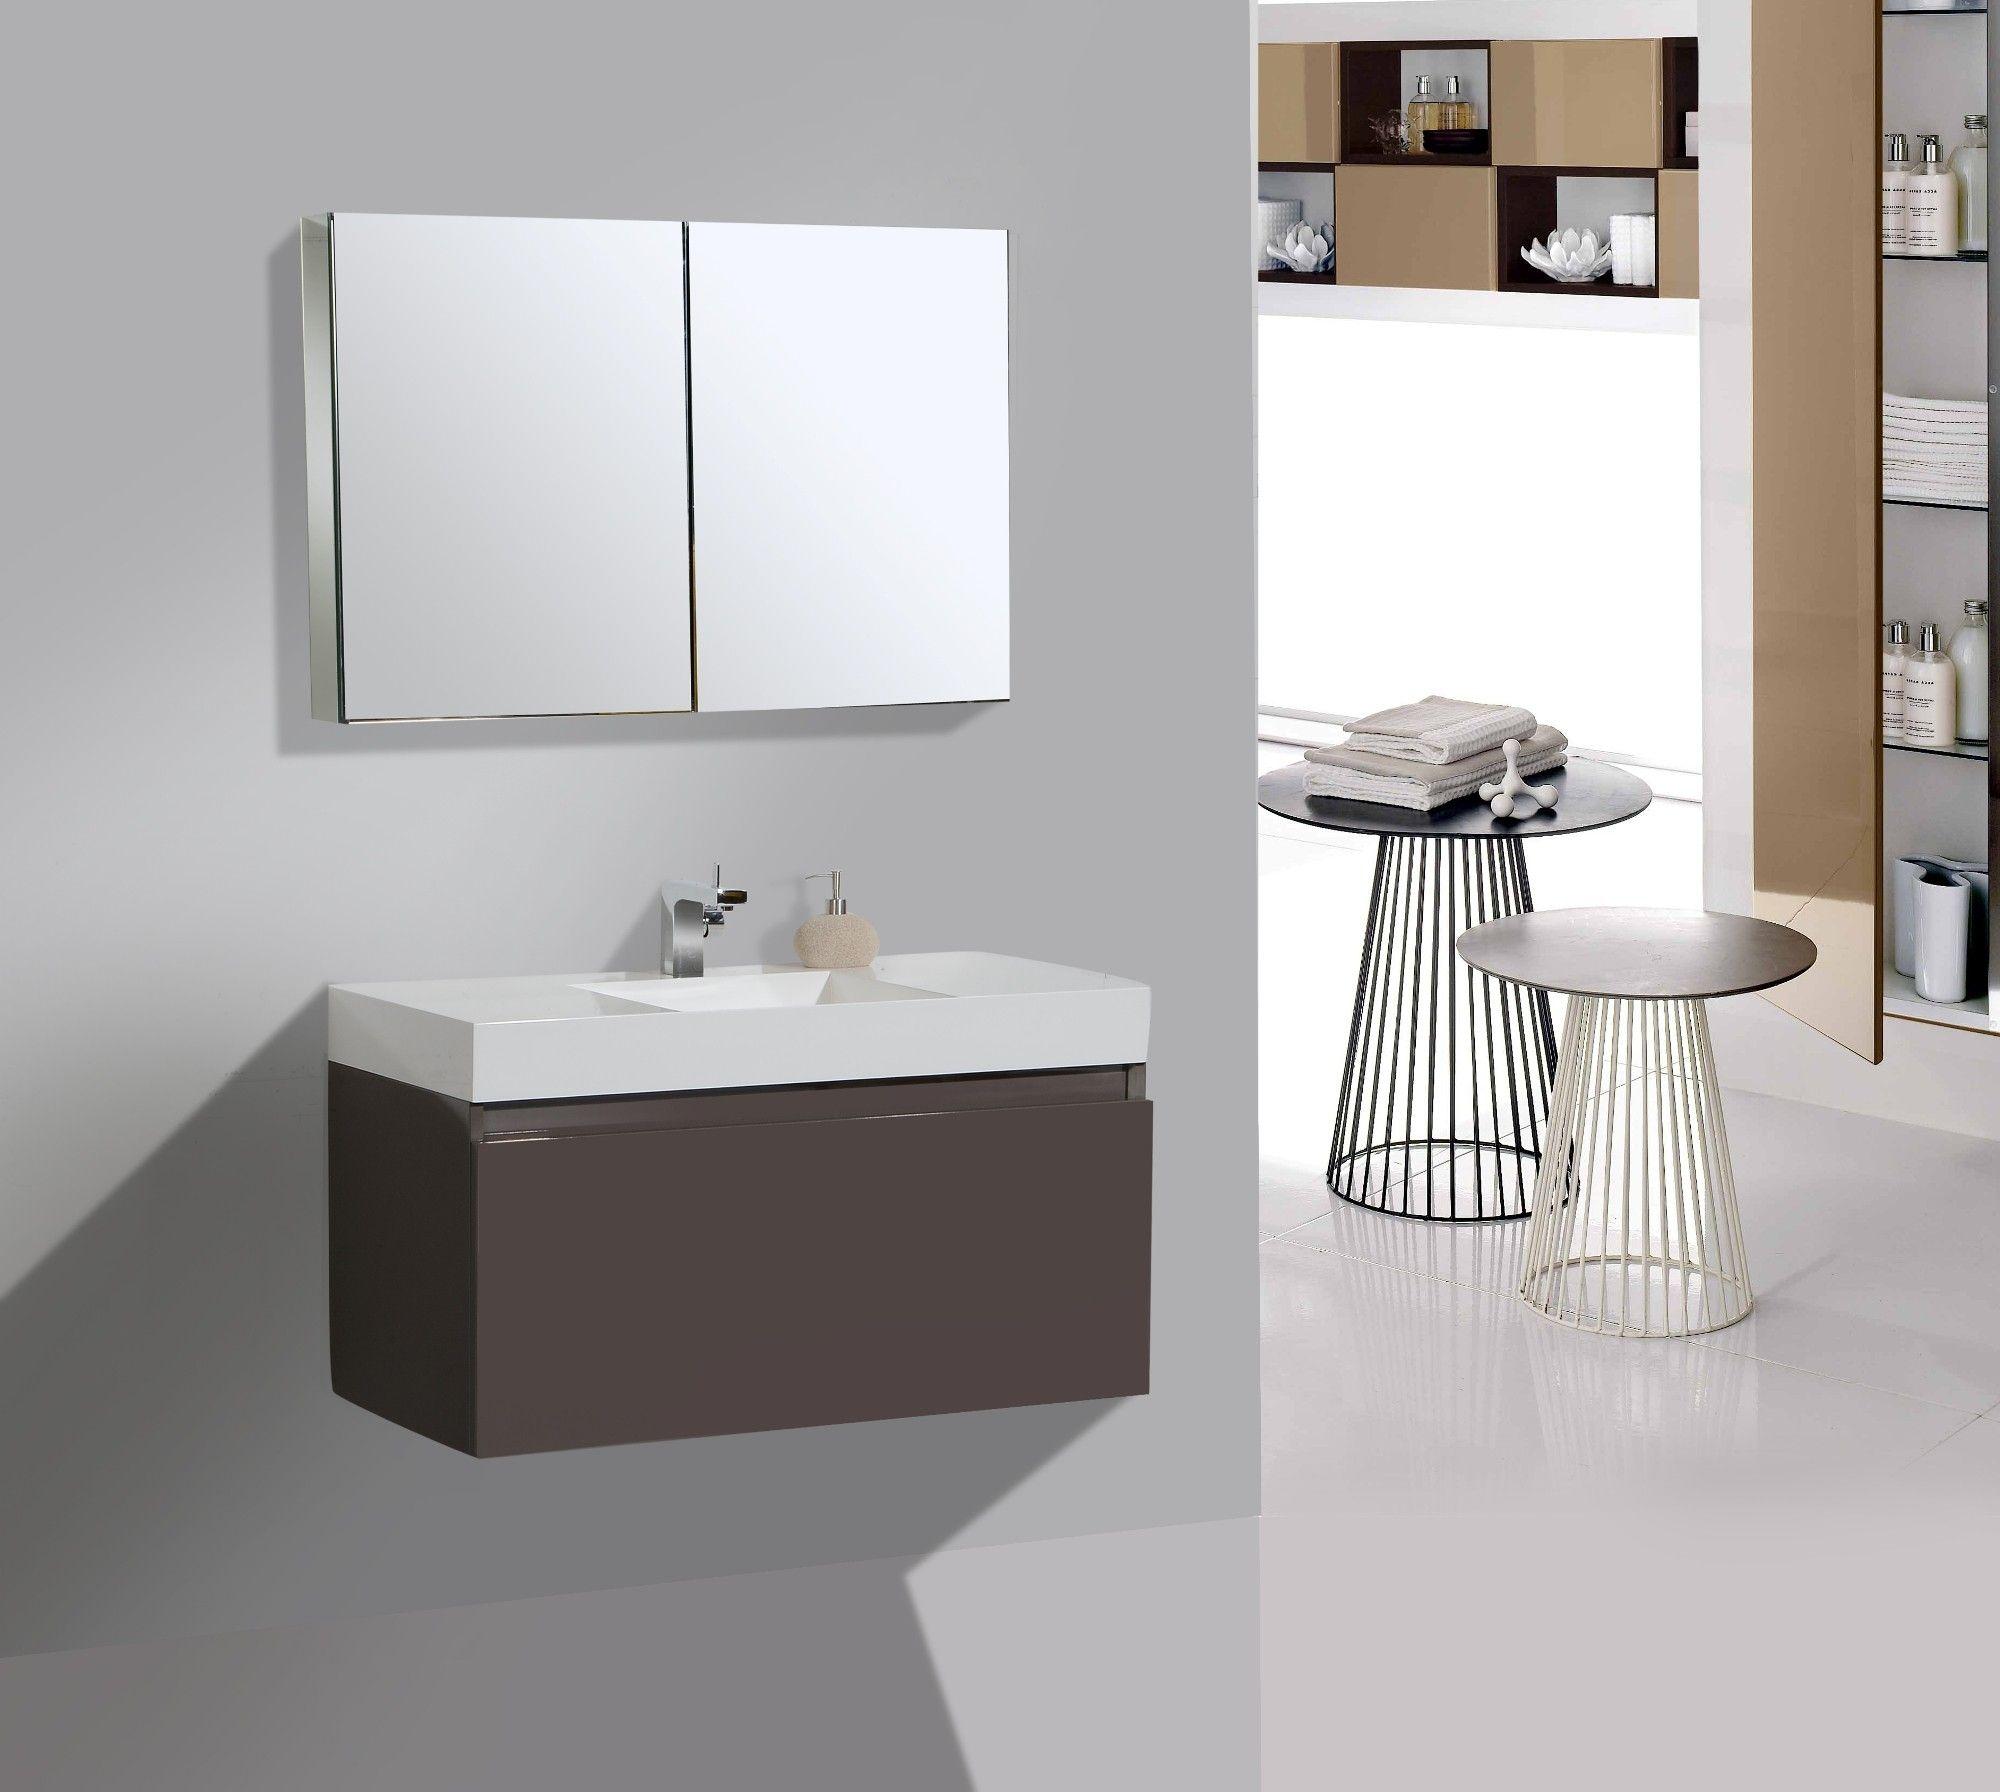 Aqua Decor Venice 39 Modern Bathroom Vanity Set W Medicine